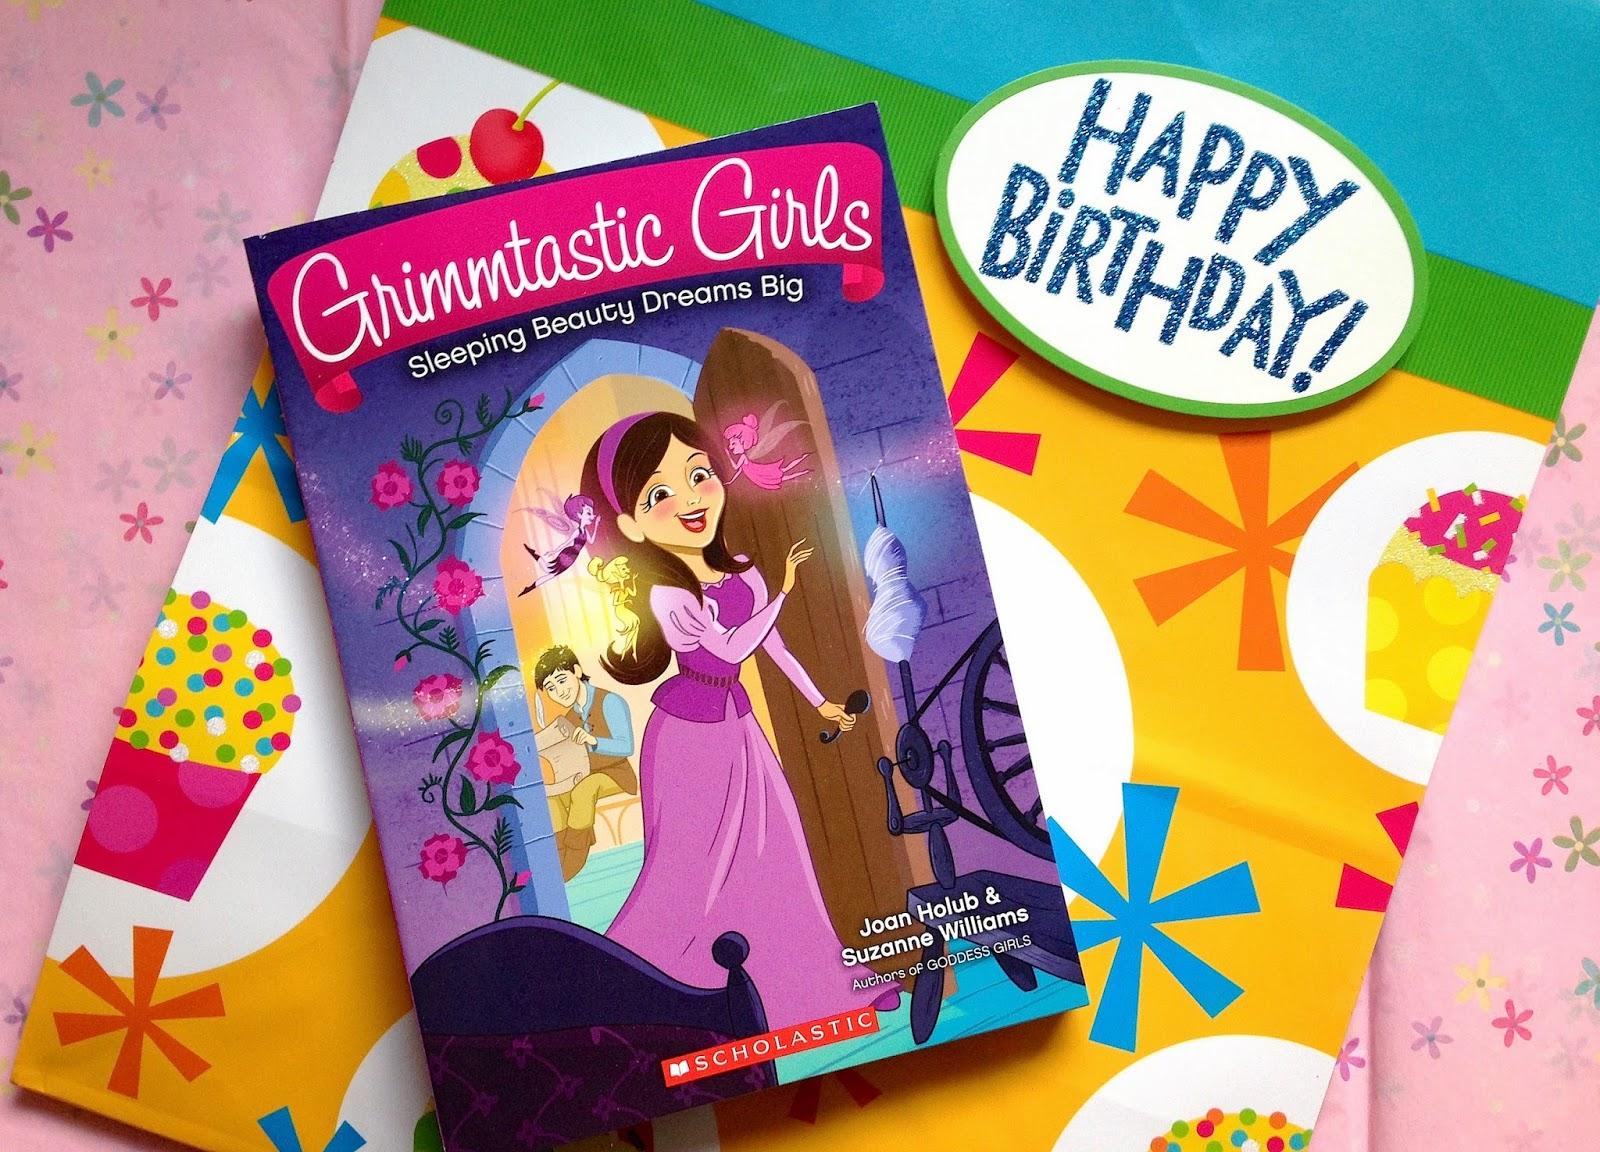 Grimmtastic Girls #4: Rapunzel Cuts Loose